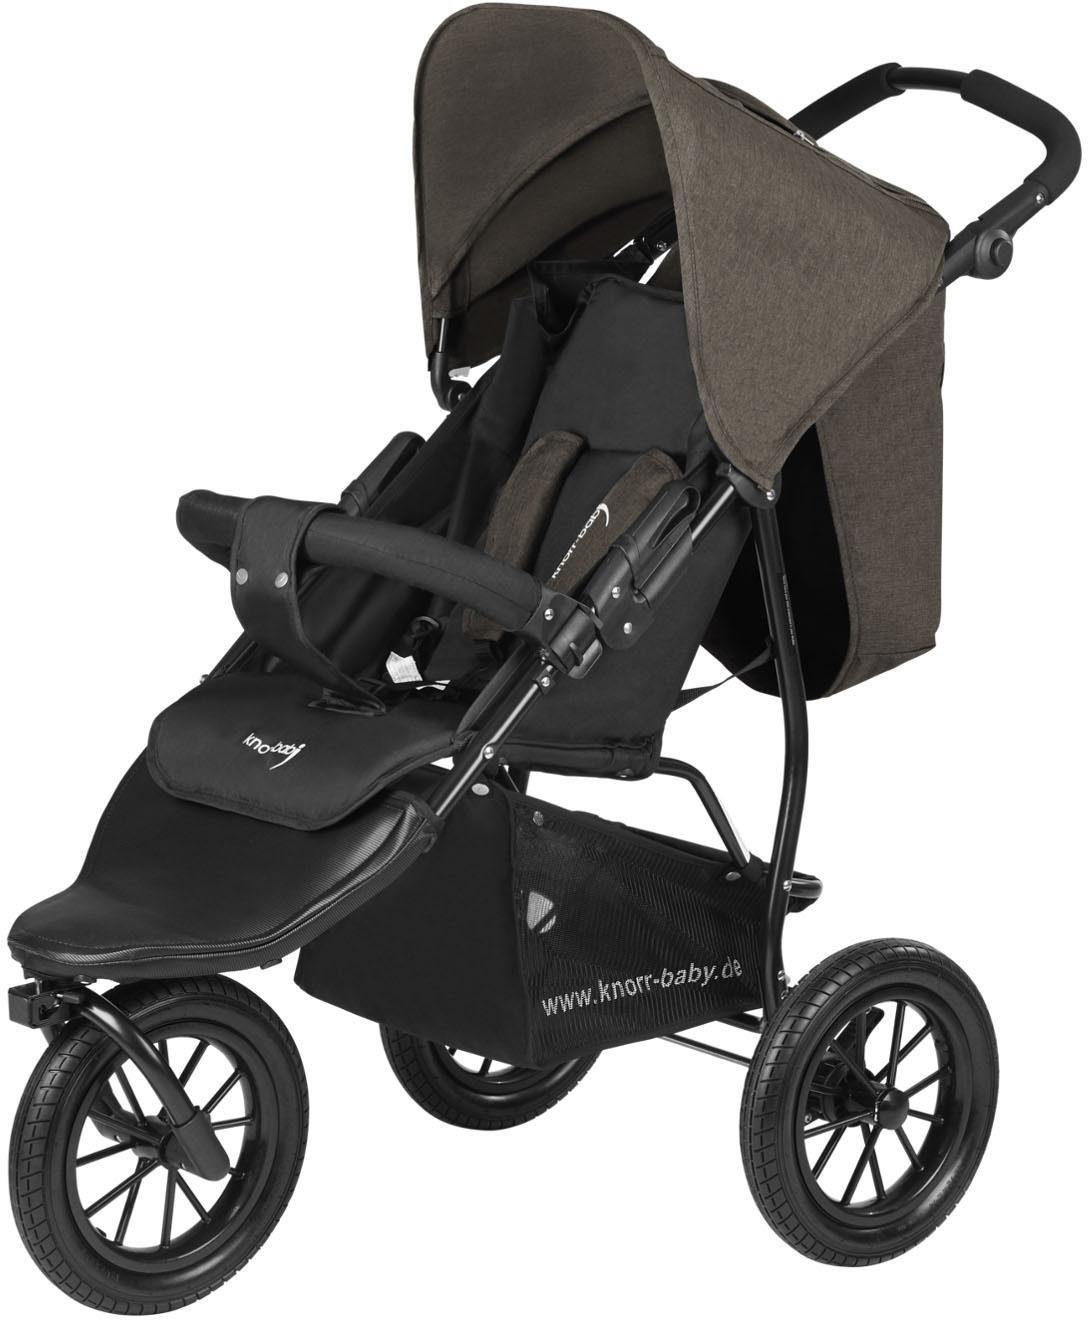 knorr-baby Jogger-Kinderwagen, »Joggy S Melange, braun«